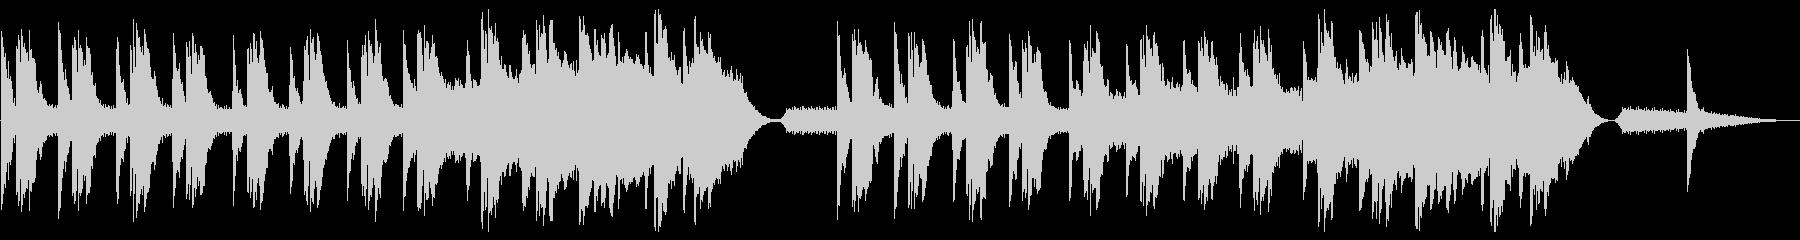 T.V.コンテンポラリー。感情的な...の未再生の波形